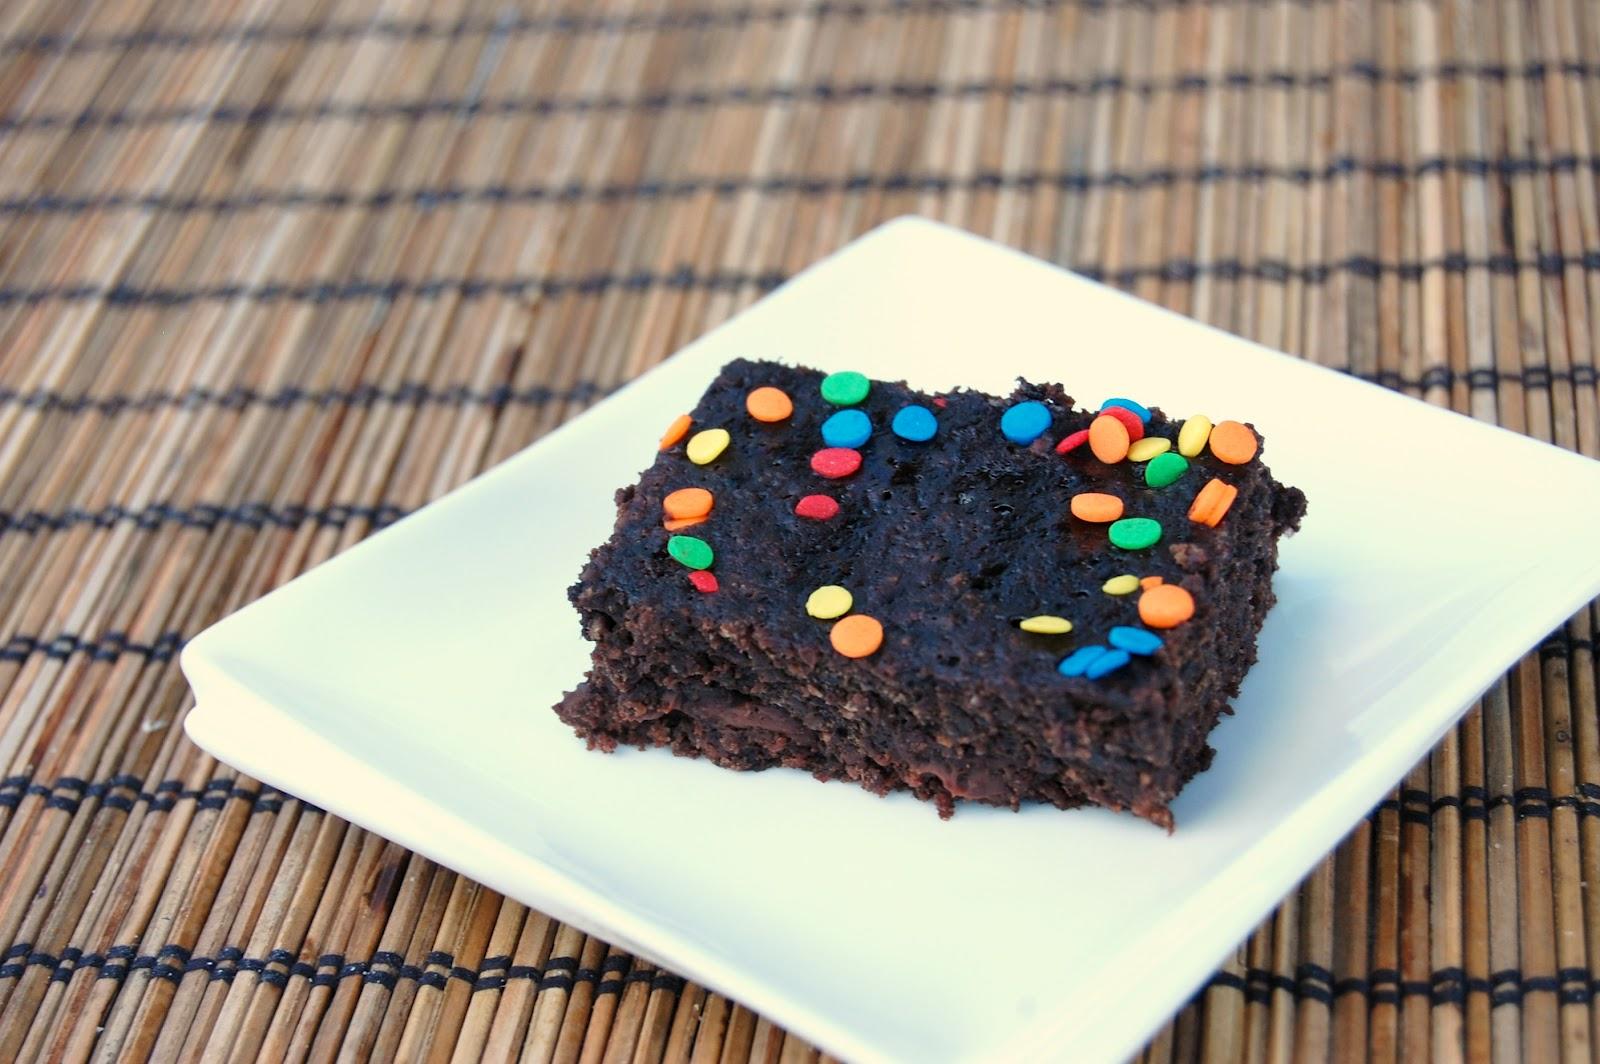 Communication on this topic: Sneaky Brownies, sneaky-brownies/